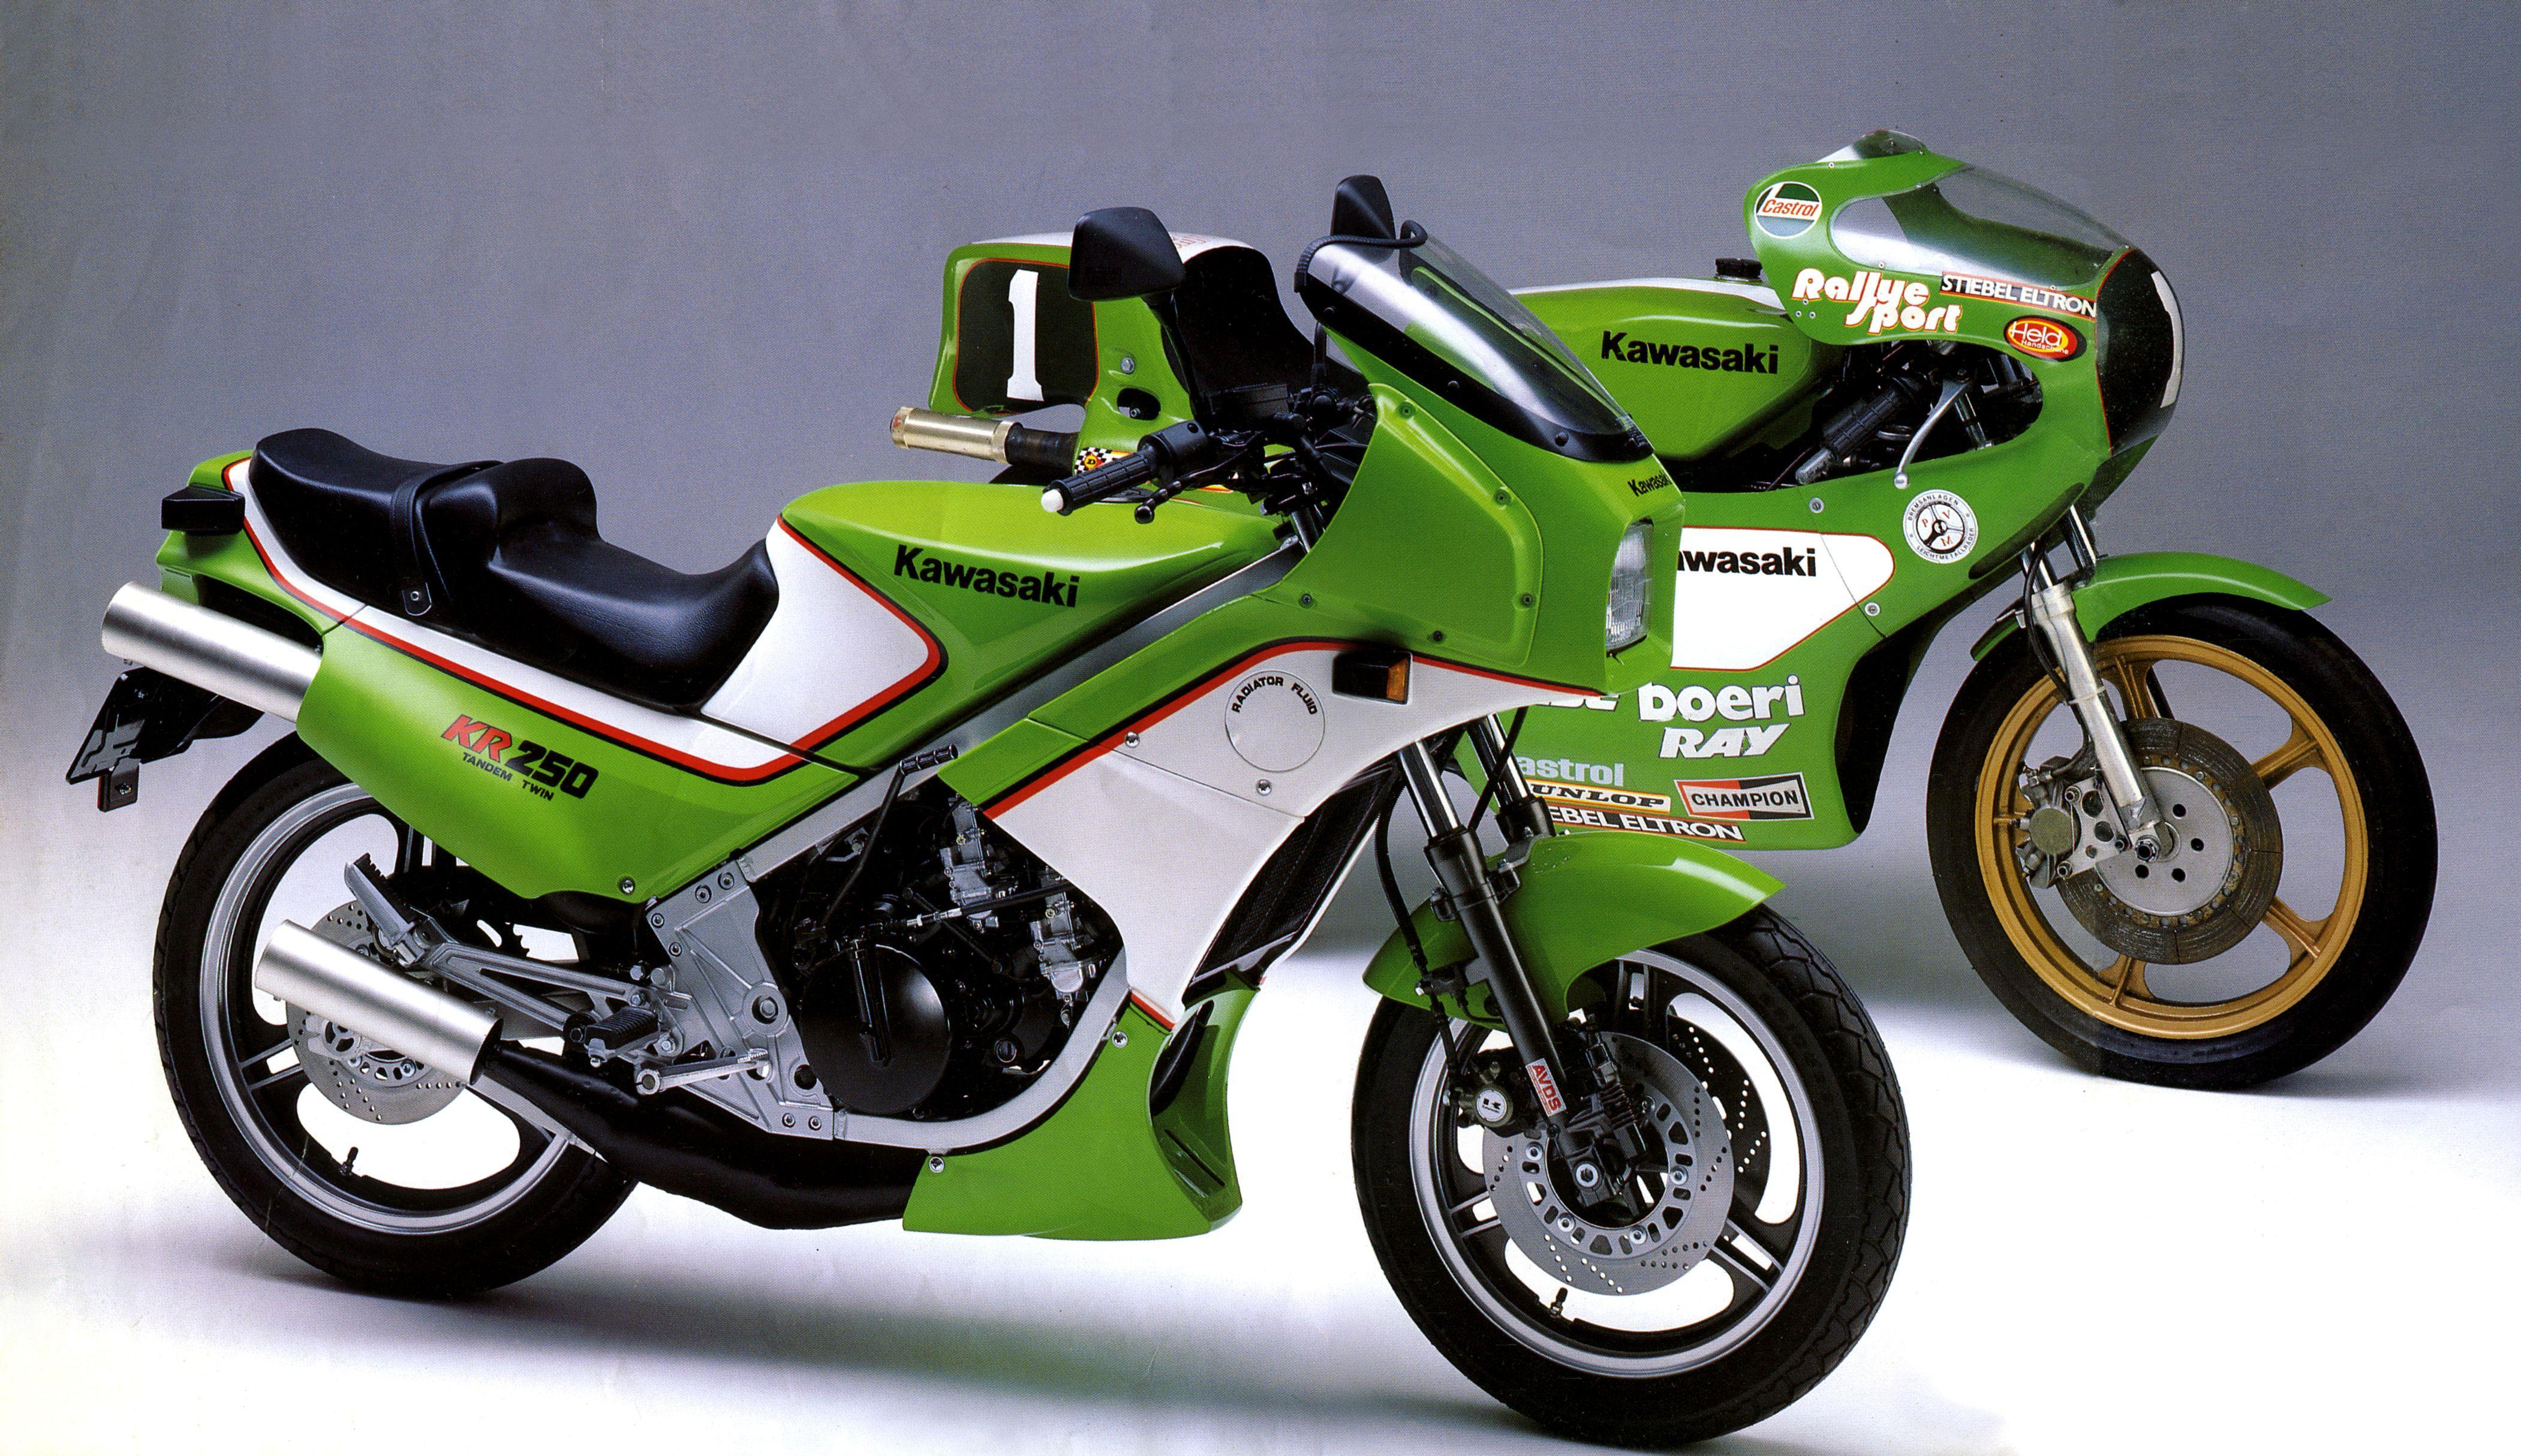 Kawasaki KR250A & KR250 GP Grand Prix Racing Motorcycle